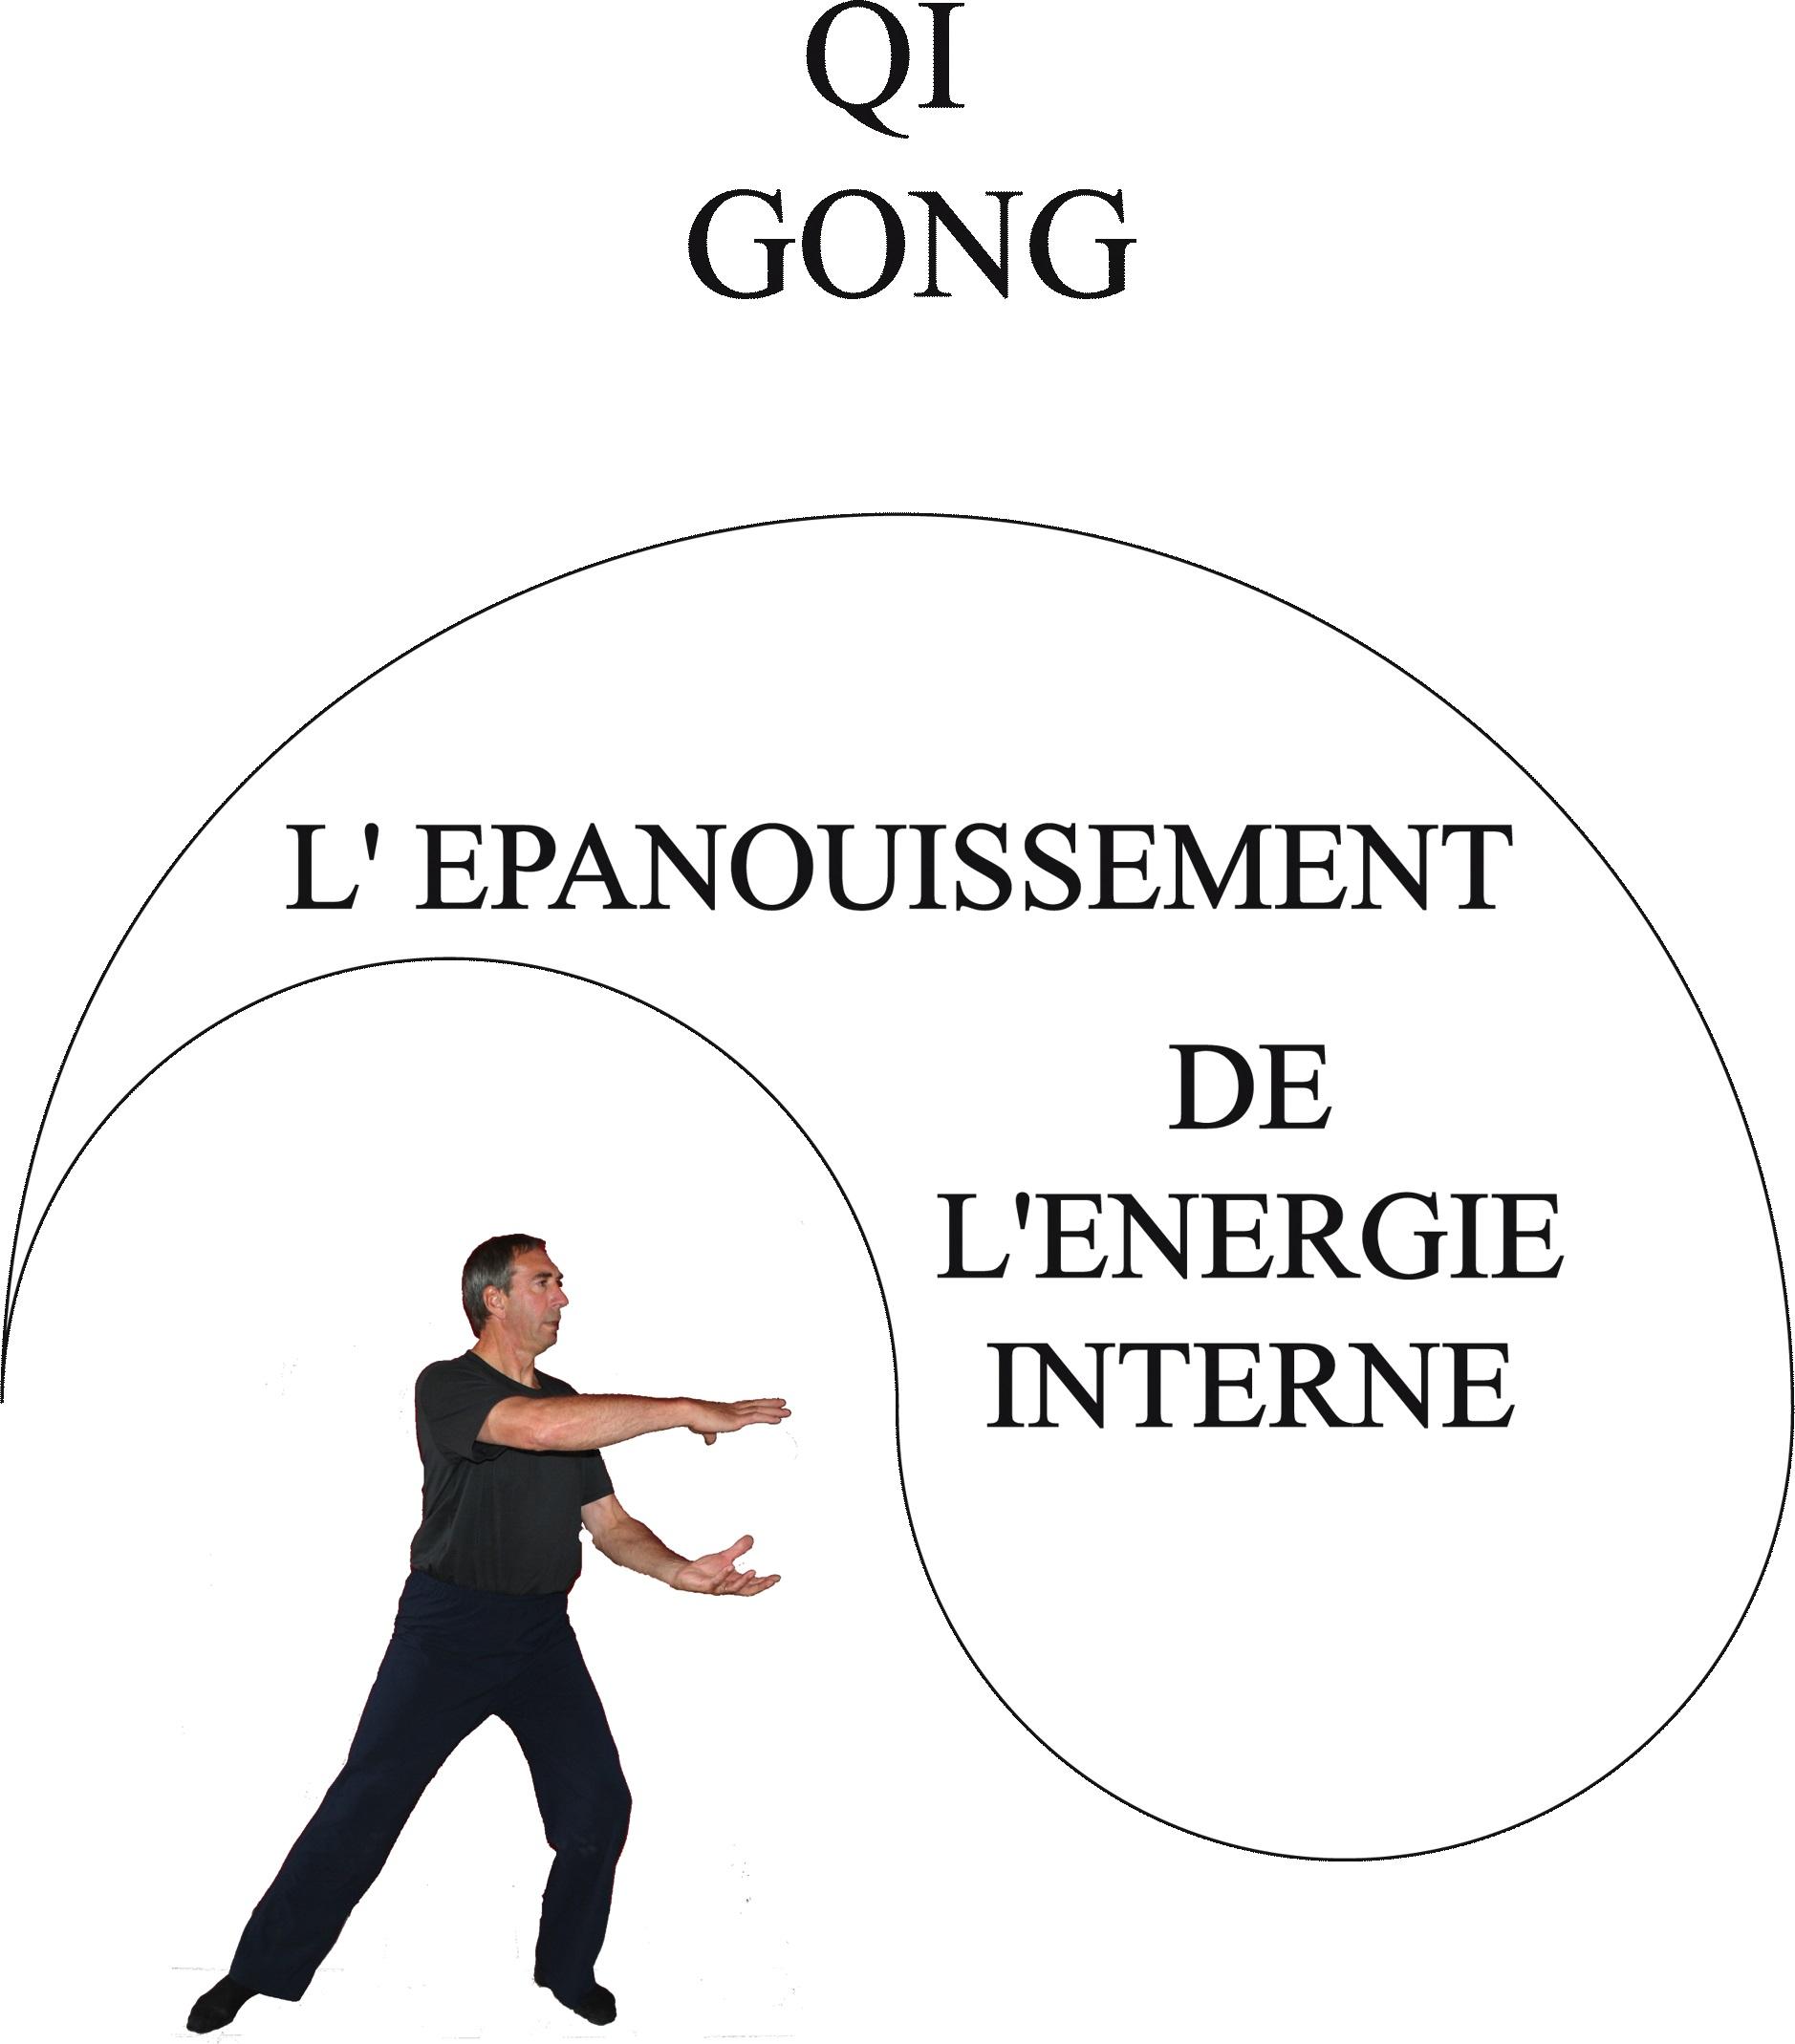 image Qi gong 2019 jpeg.jpg